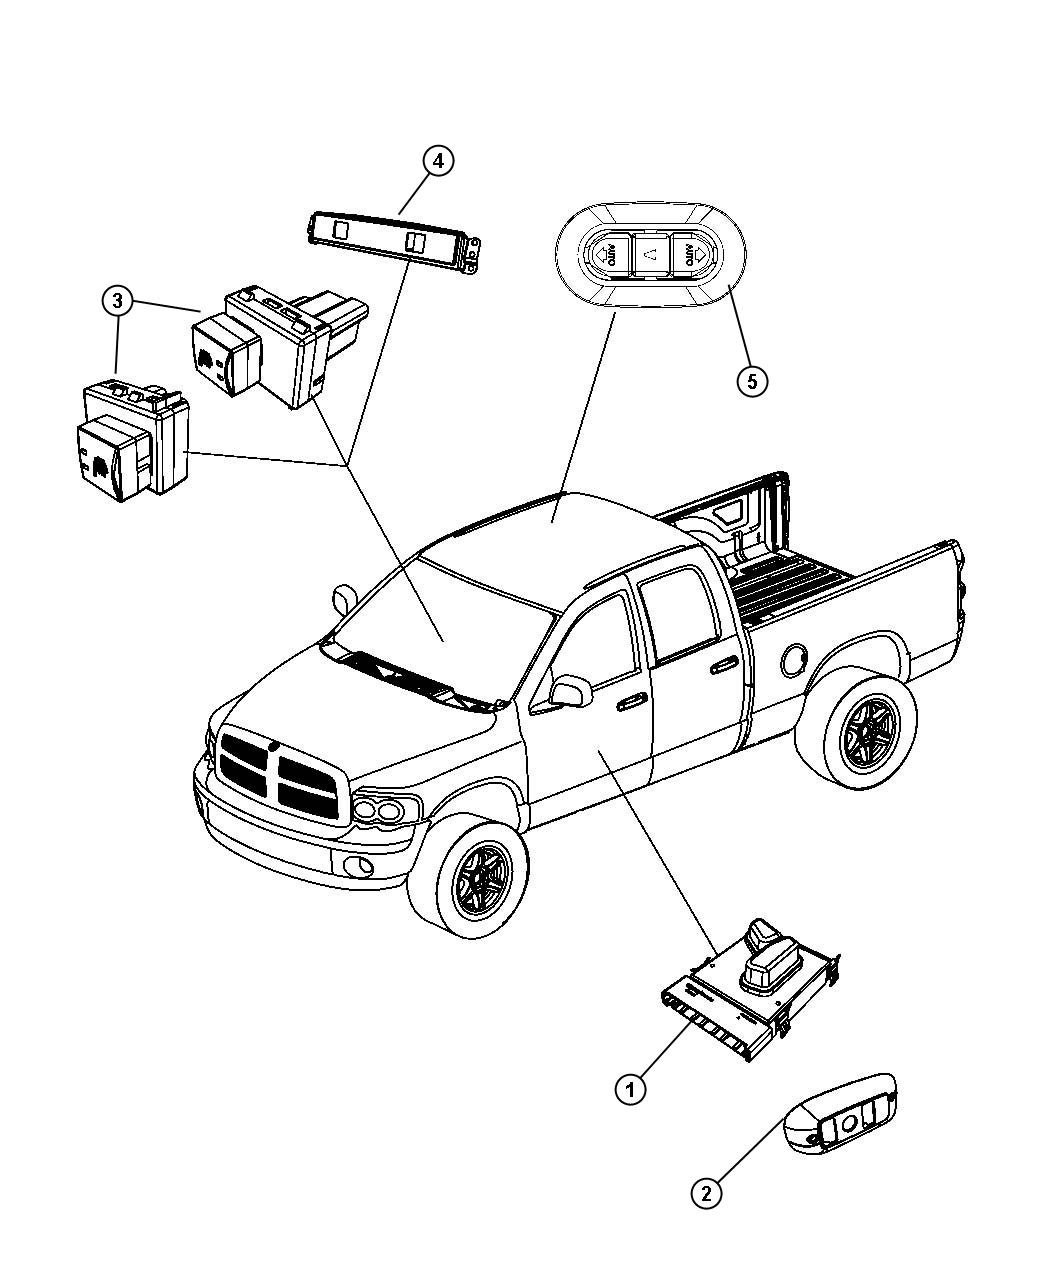 Dodge Ram 1500 Switch. Sunroof. Trim: [all trim codes